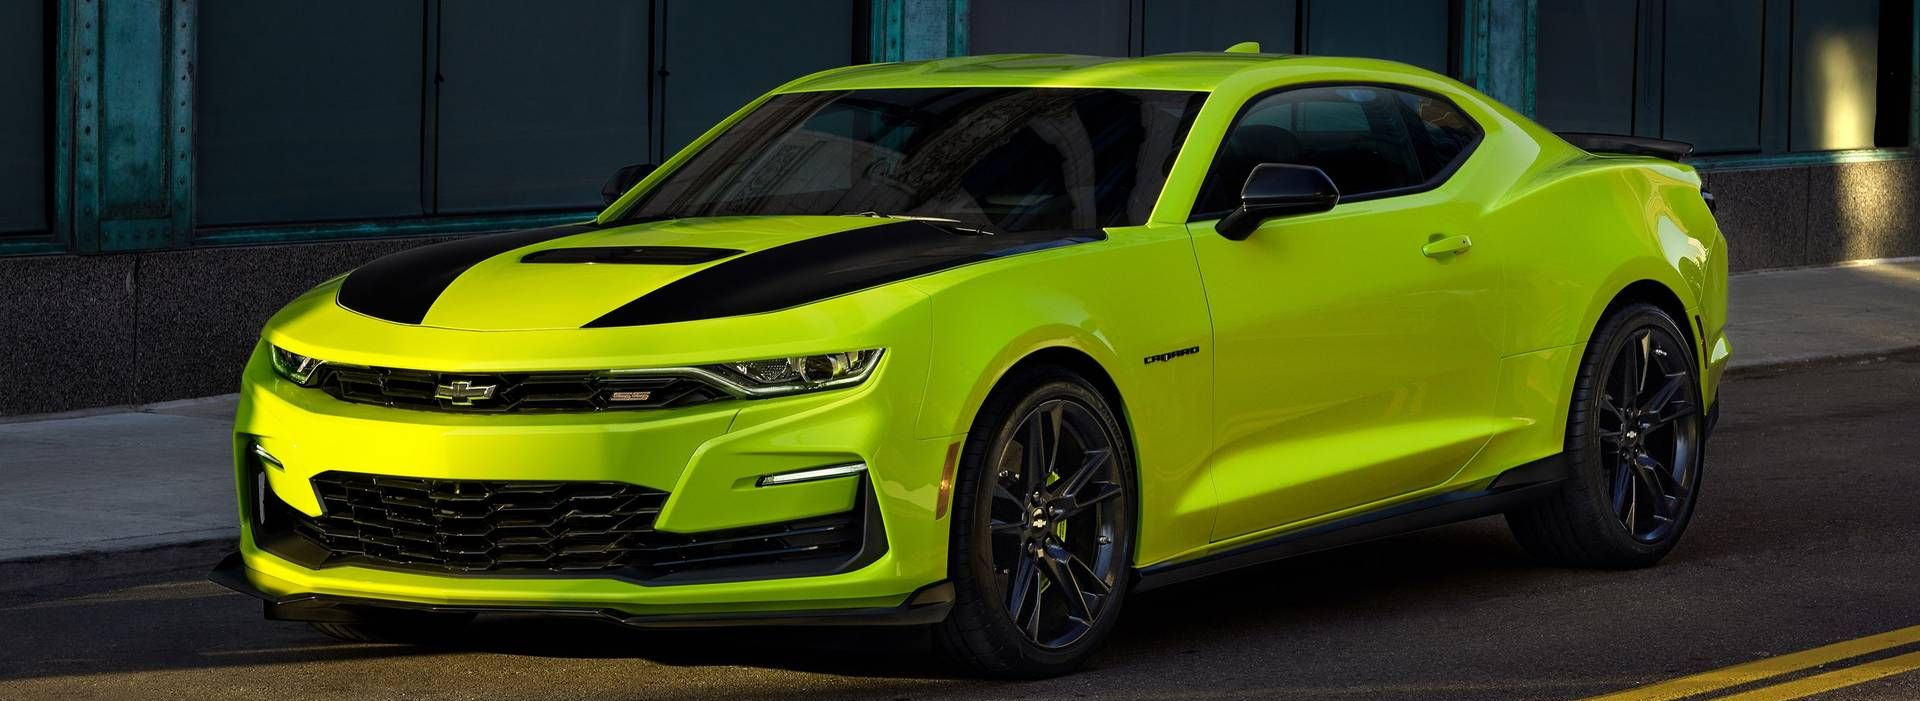 Camaro Ss Lease >> 2019 Chevrolet Camaro Leasing Near Tulsa Ok David Stanley